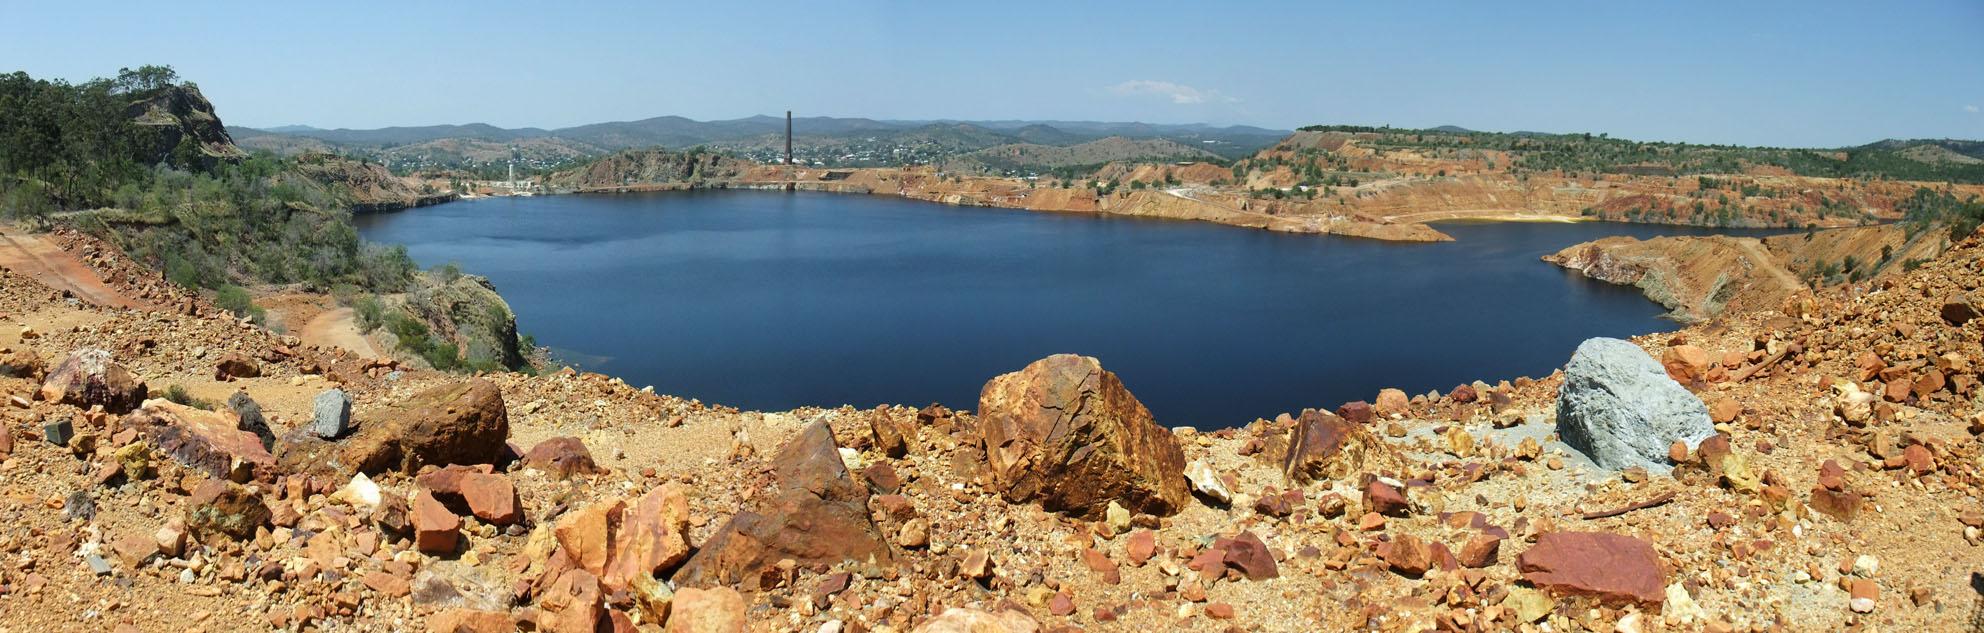 Mtmorgan_Panorama1